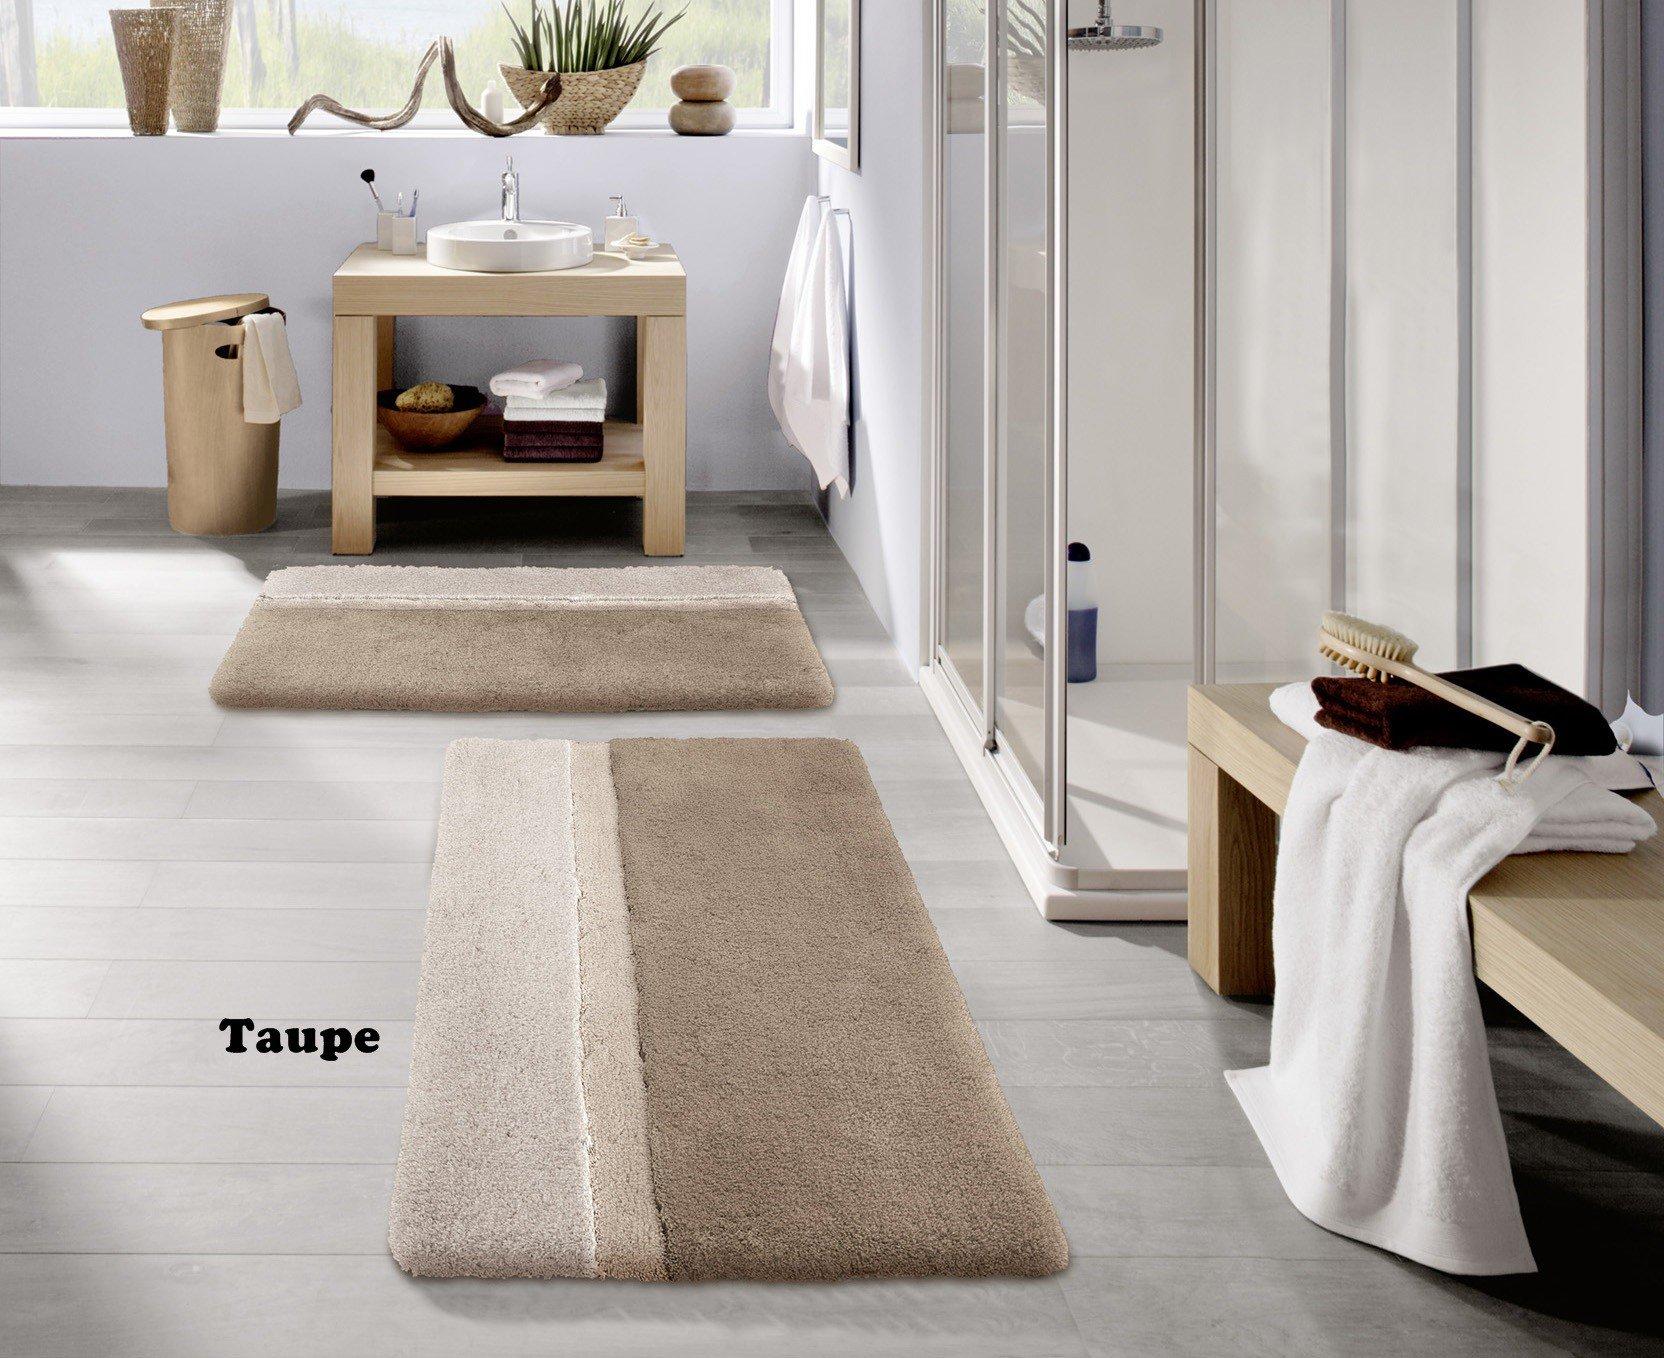 Kleine Wolke Eco Living Life Non Slip Cotton Bathroom Rug (27.6'' x 47.2'', Taupe) by Kleine Wolke